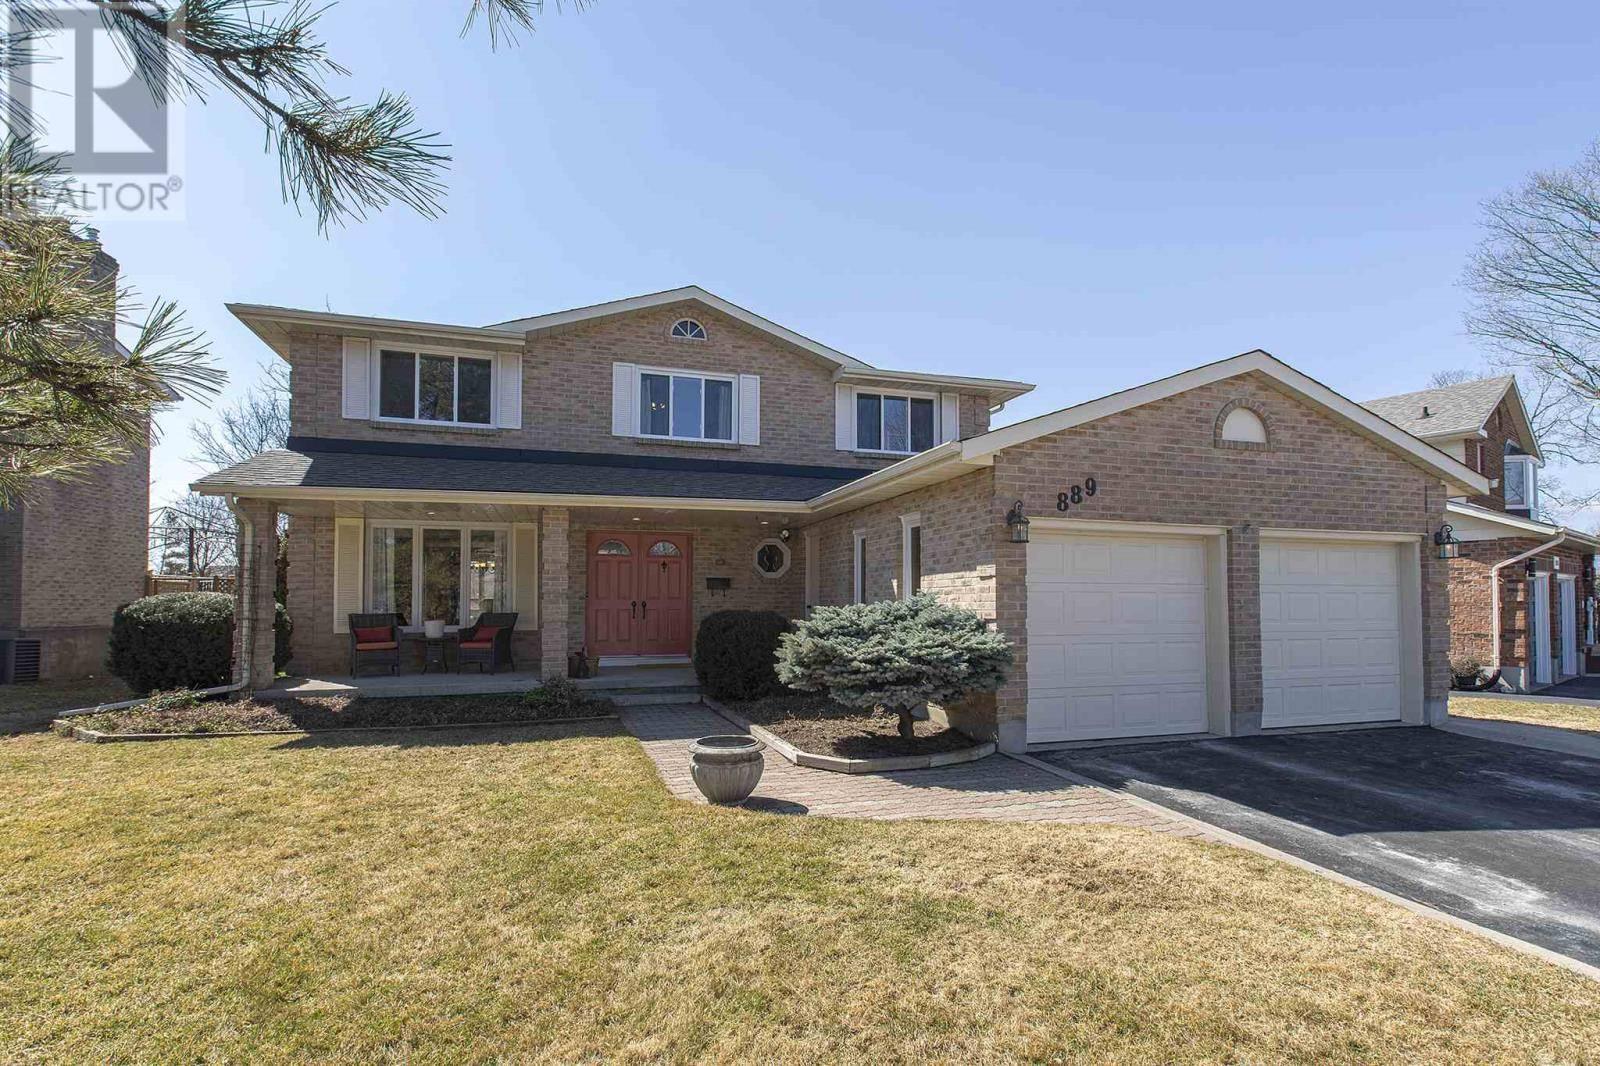 House for sale at 889 Mona Dr Kingston Ontario - MLS: K20001723